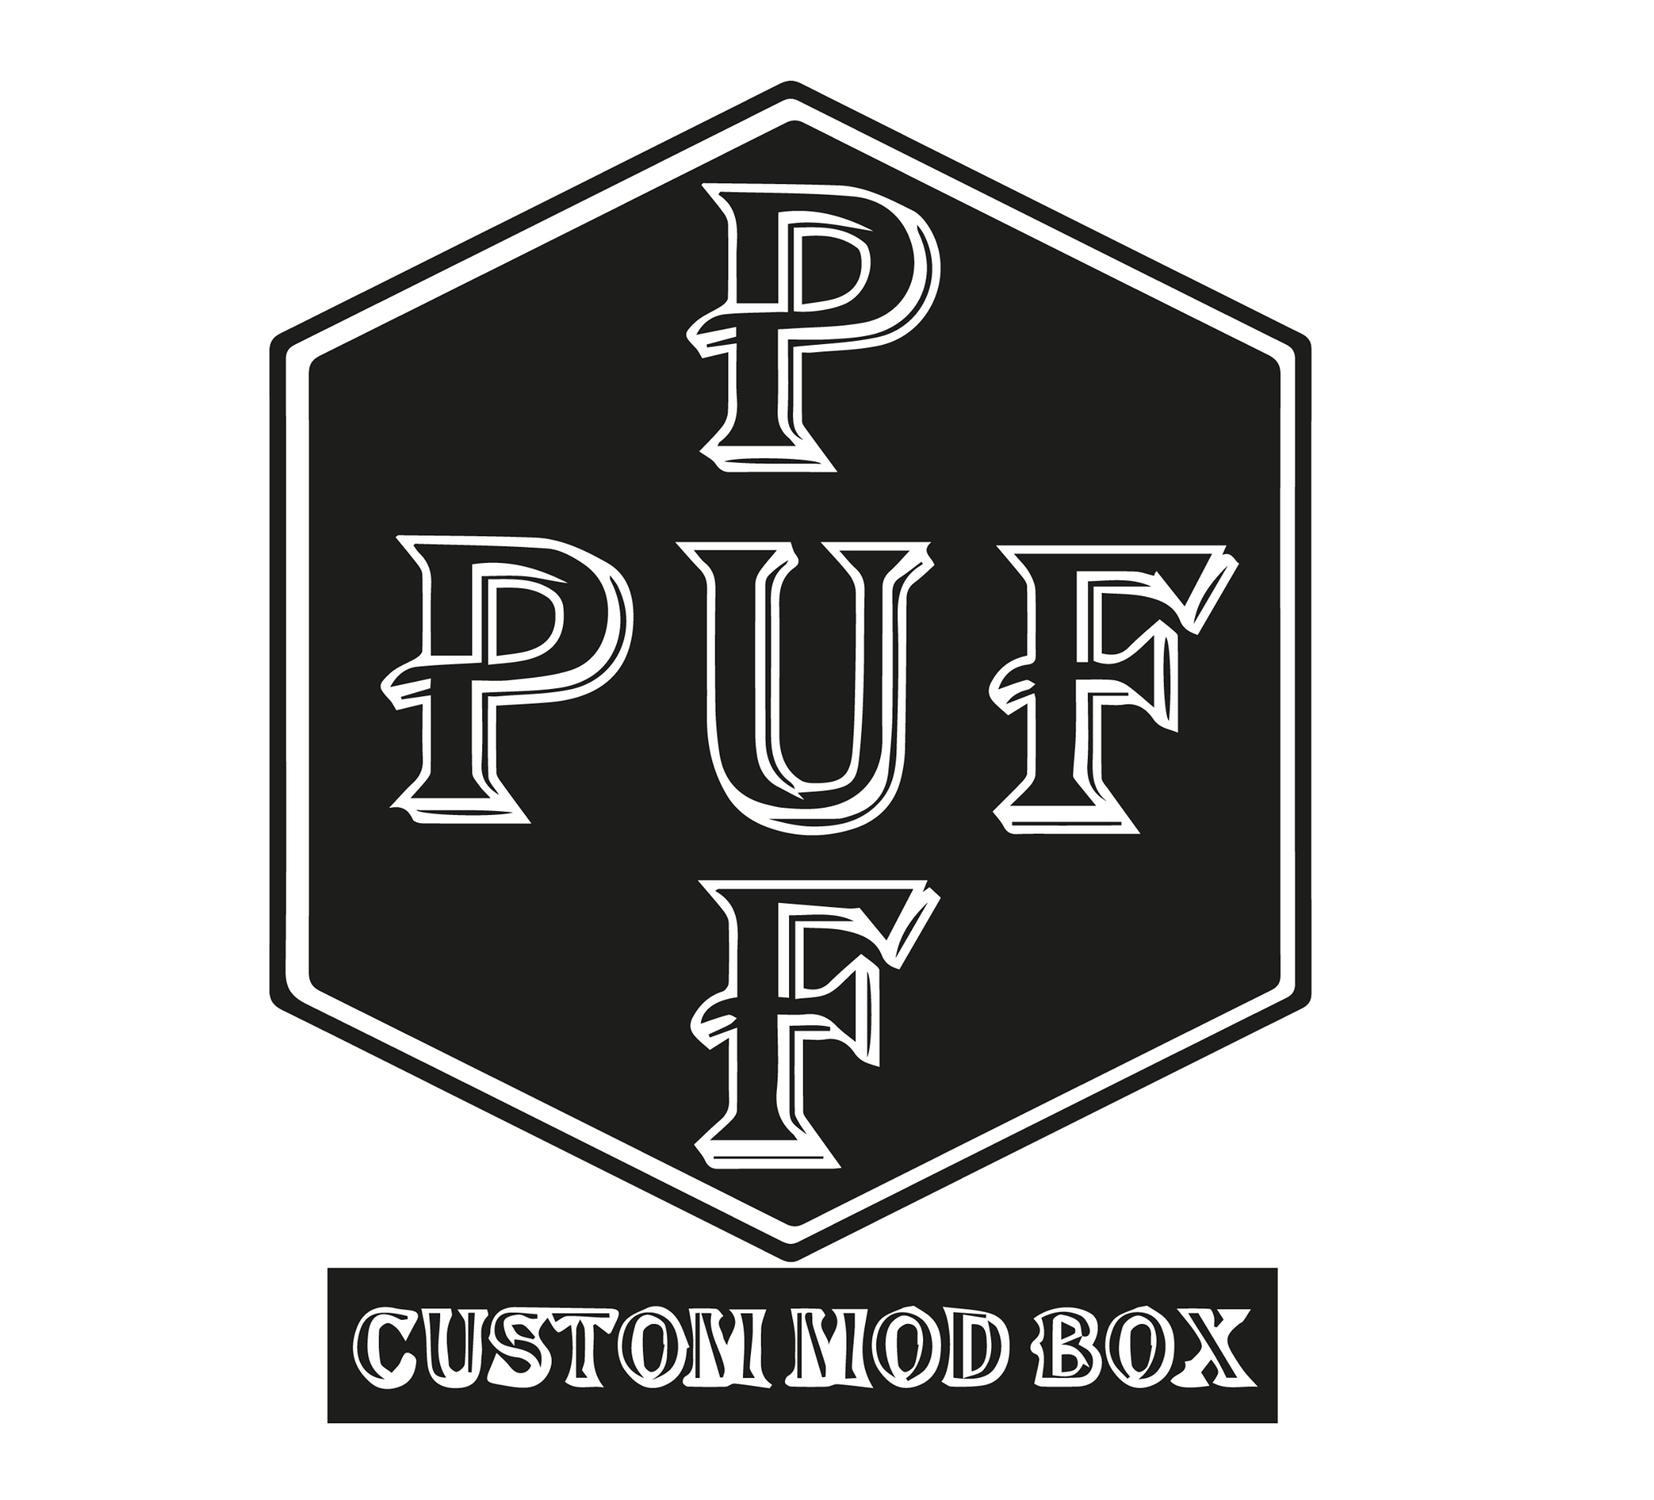 Puf Puf Custom ModBox